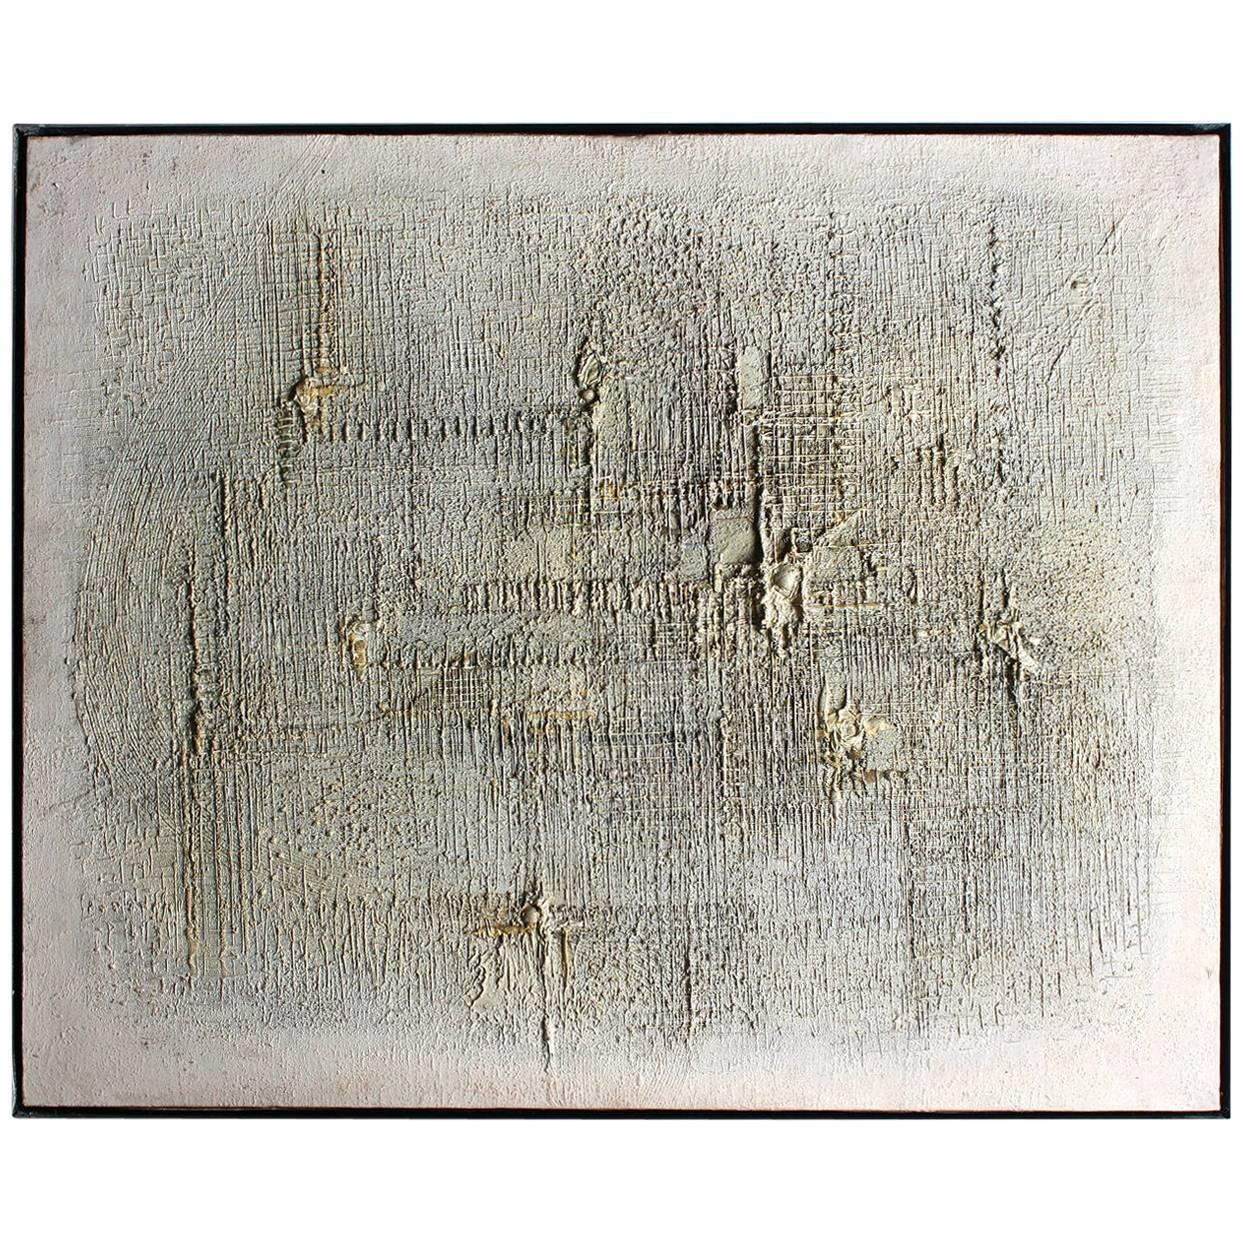 Z. Salaburski, Warszawa Abstract Oil Painting, 1962 Polish Modernist